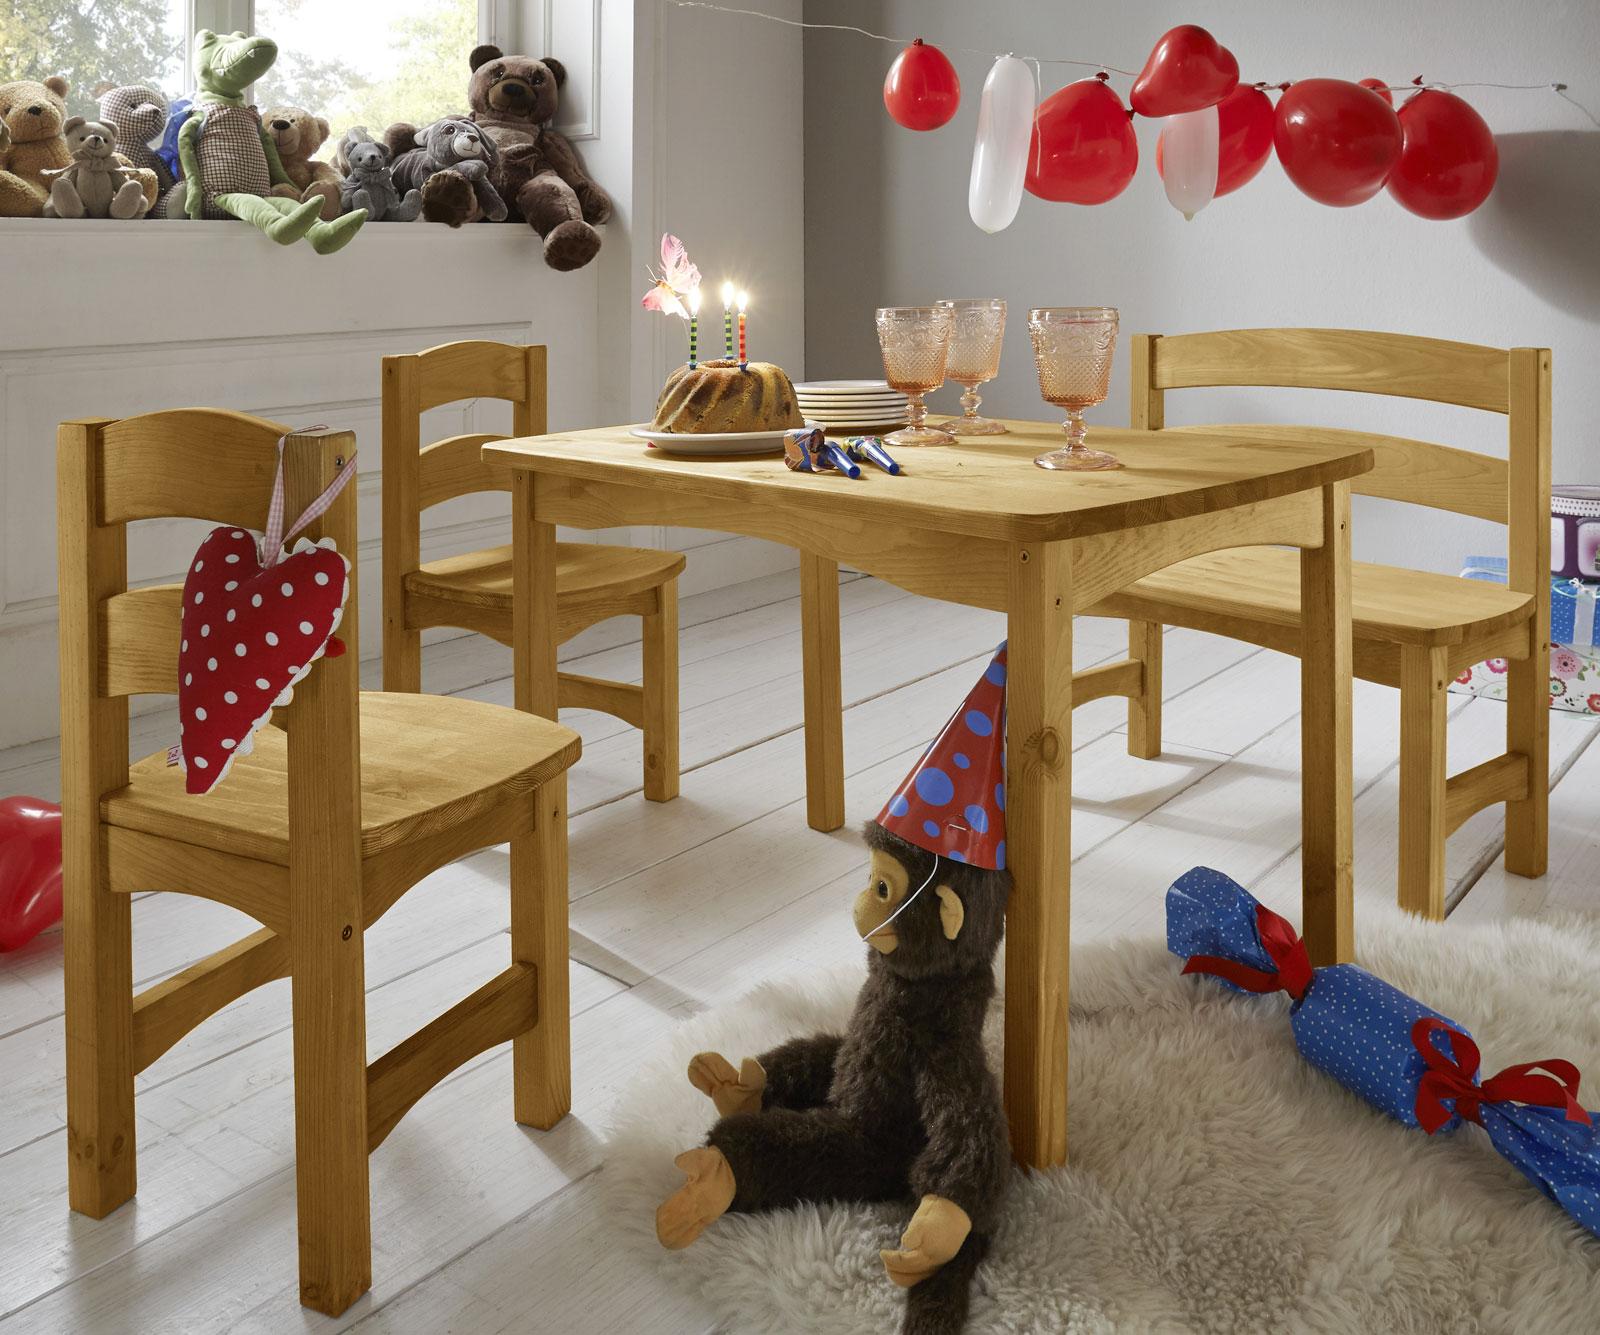 sitzgruppe f r kinder mit tisch bank und st hlen kids paradise. Black Bedroom Furniture Sets. Home Design Ideas